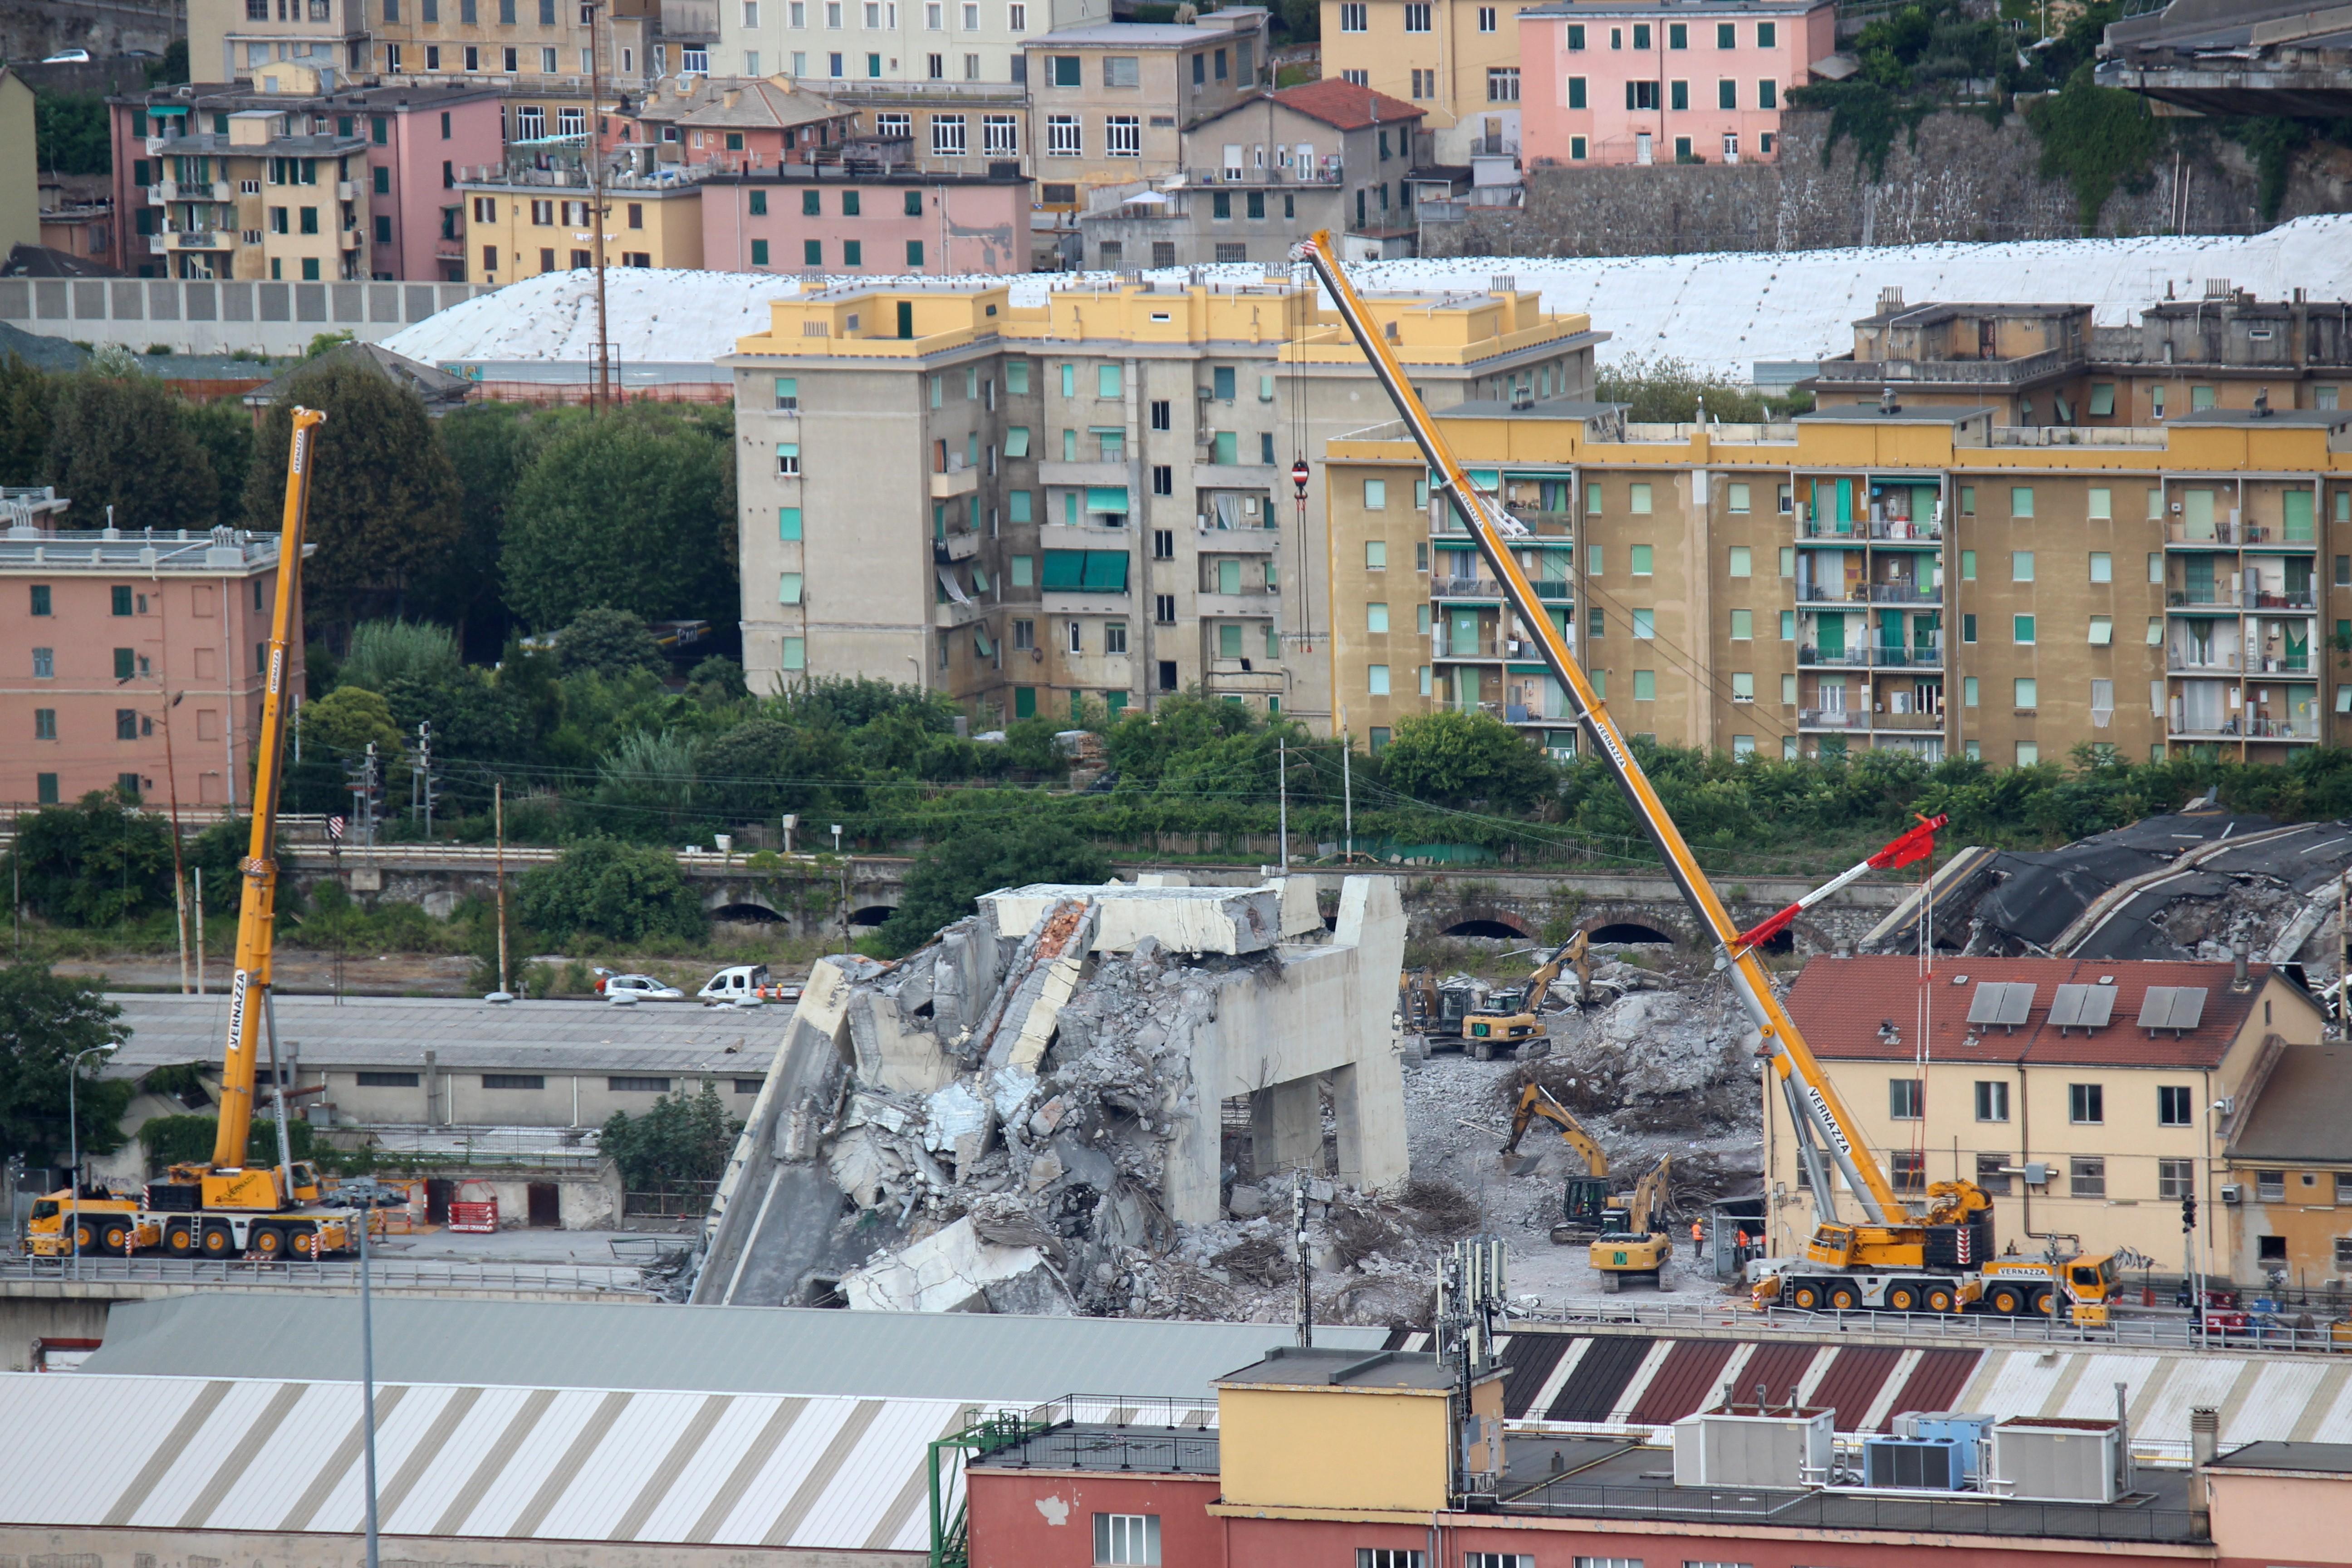 Abbrucharbeiten an der Morandi-Brücke